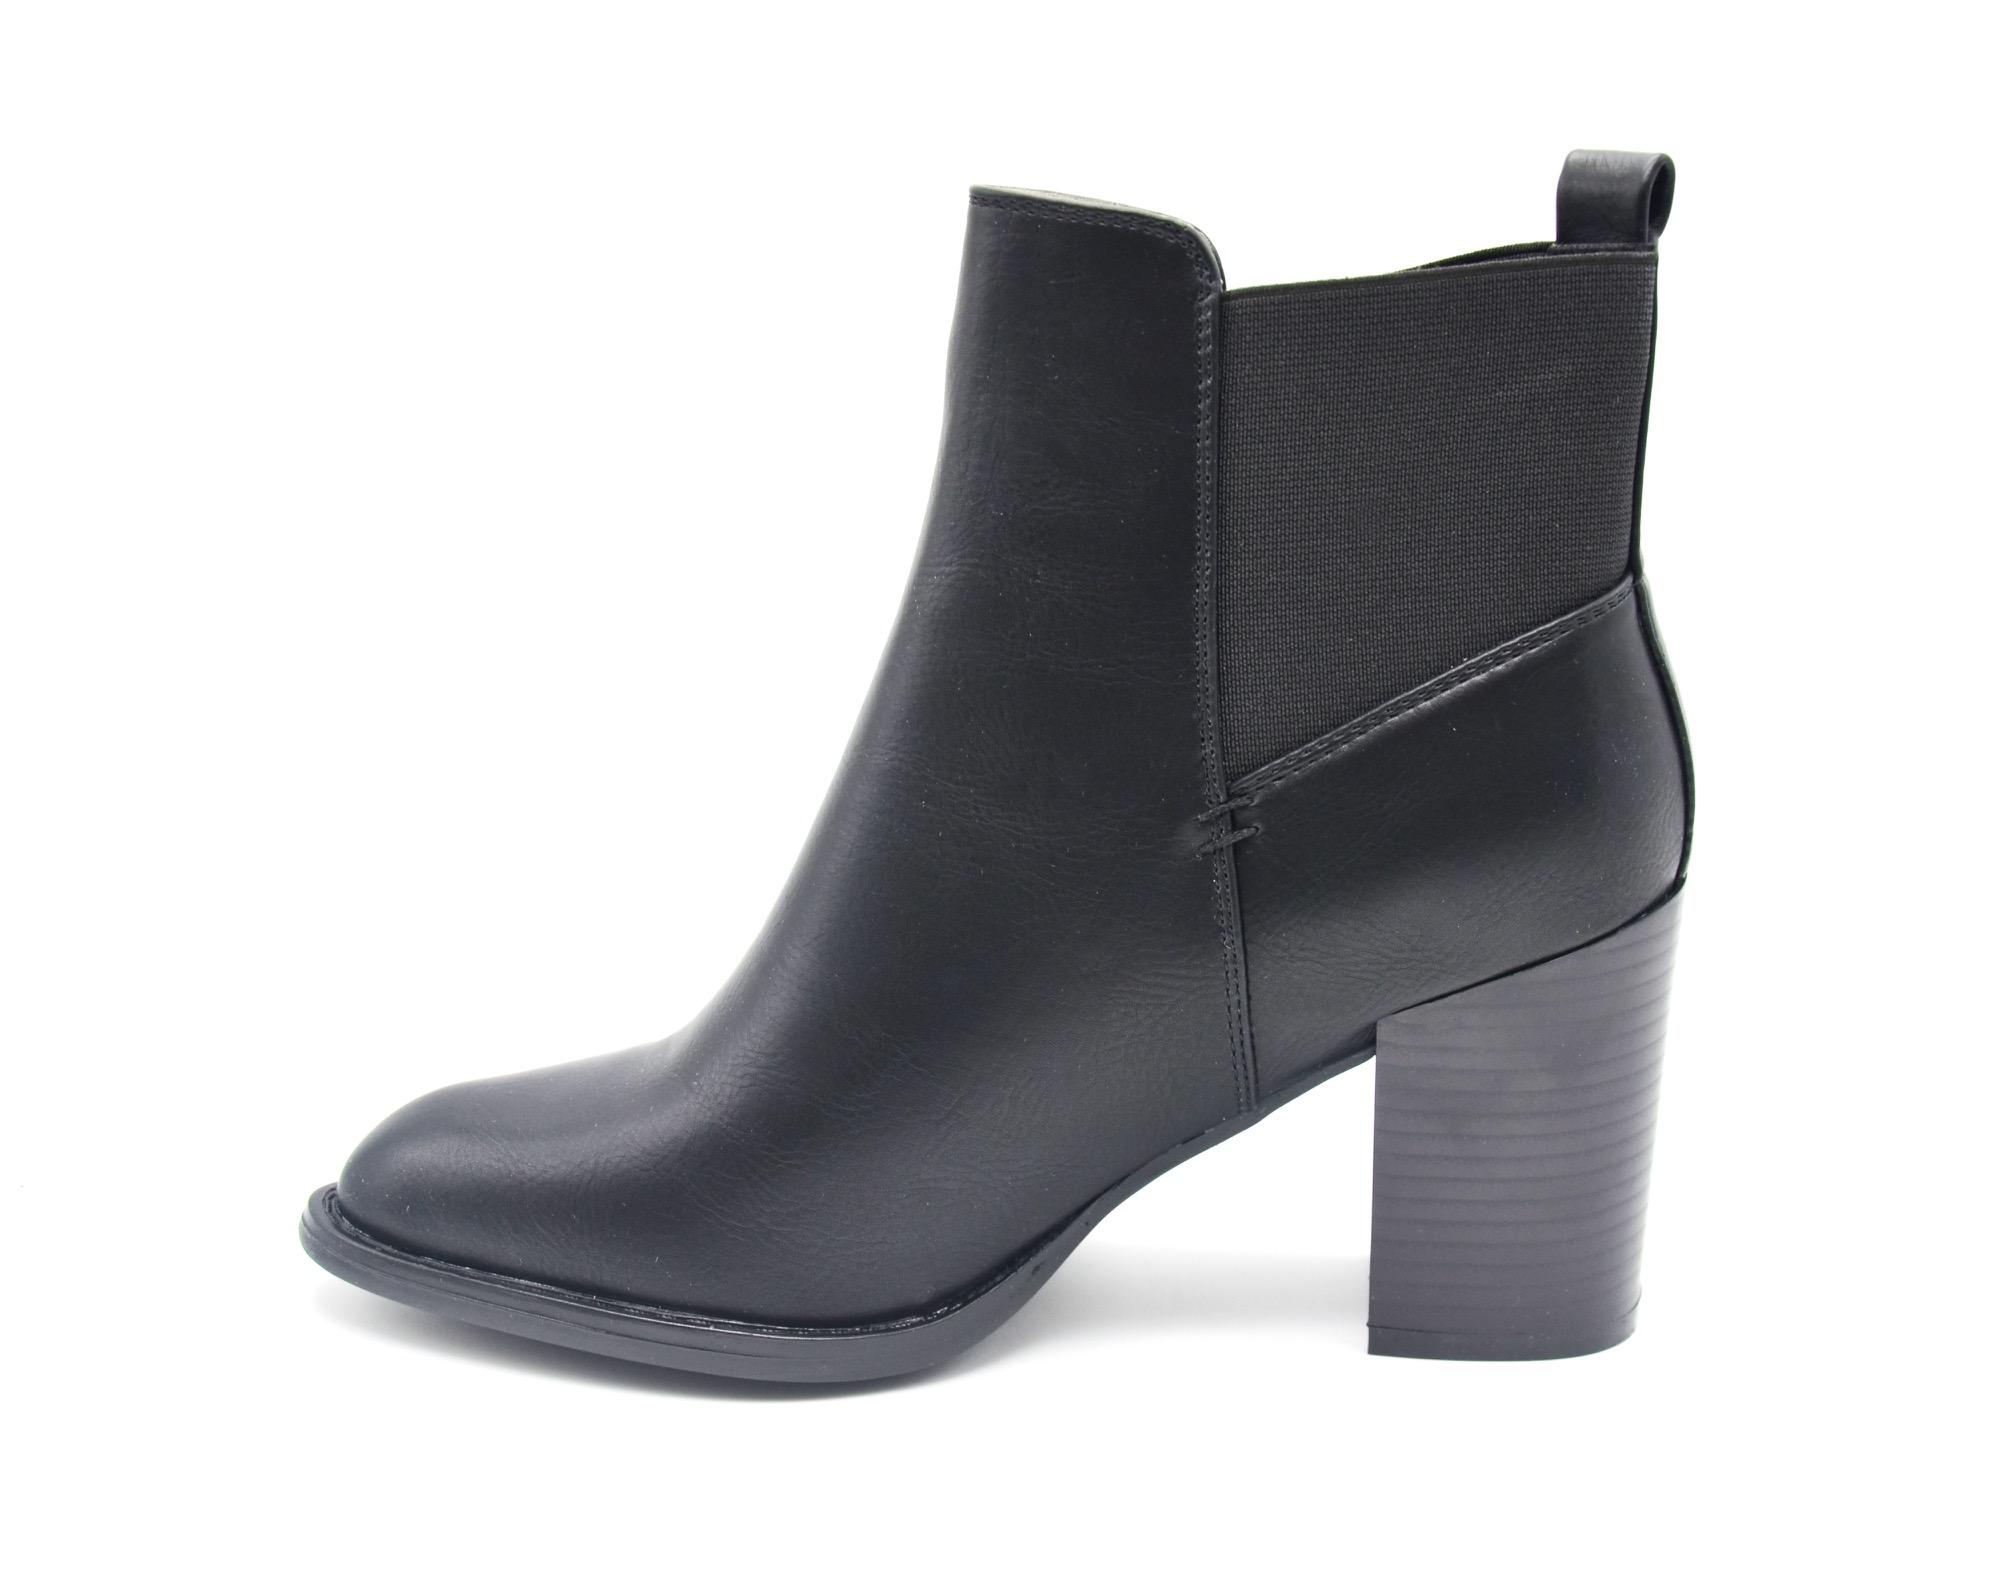 shf79 bottines boots talon carr simili cuir uni avec bout pointu et bande tissu elastique. Black Bedroom Furniture Sets. Home Design Ideas